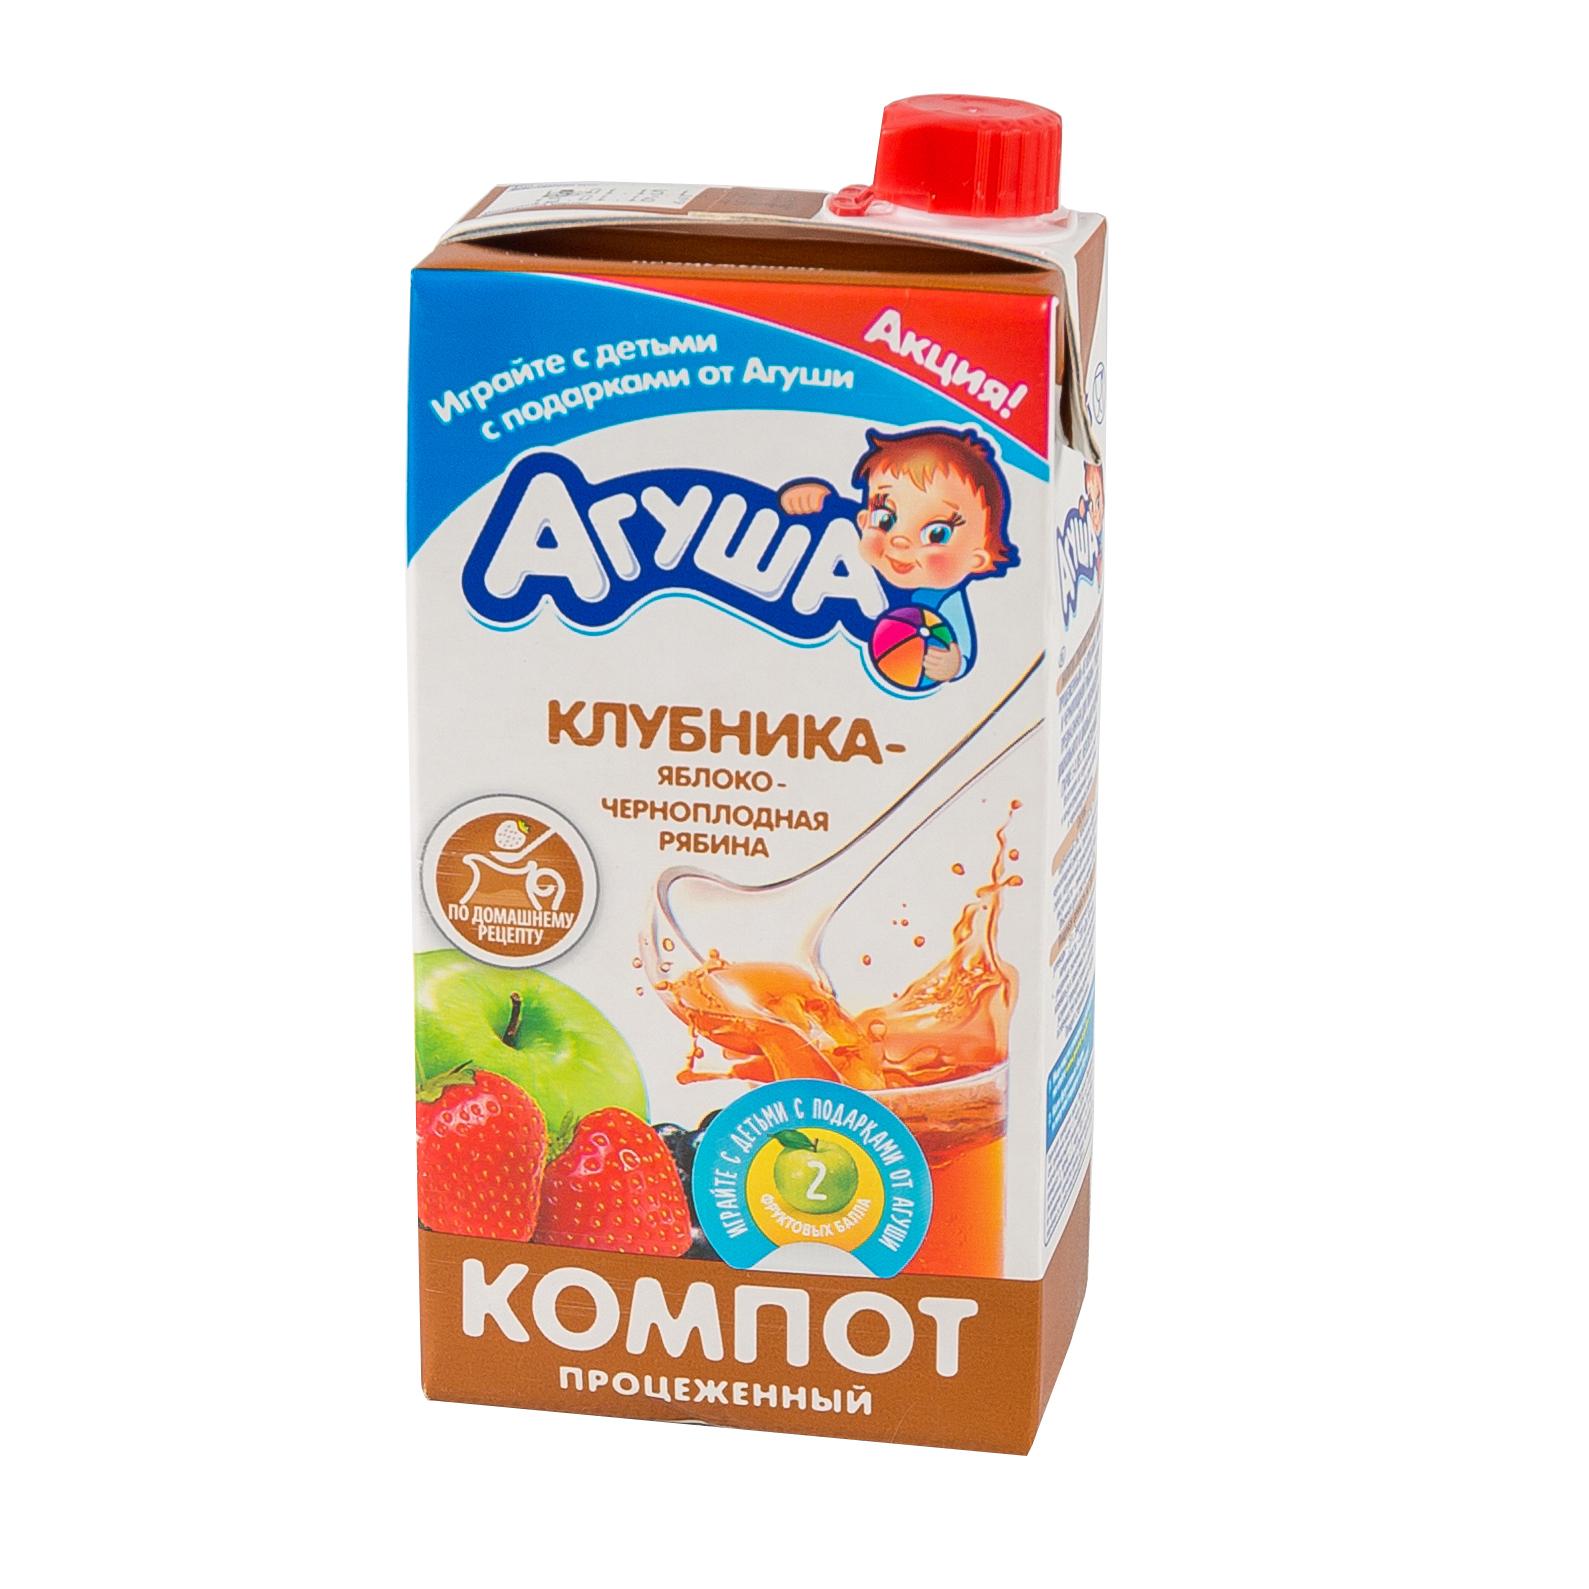 Компот Агуша 500 мл (тетрапак) Клубника яблоко черноплодная рябина (с 8 мес)<br>